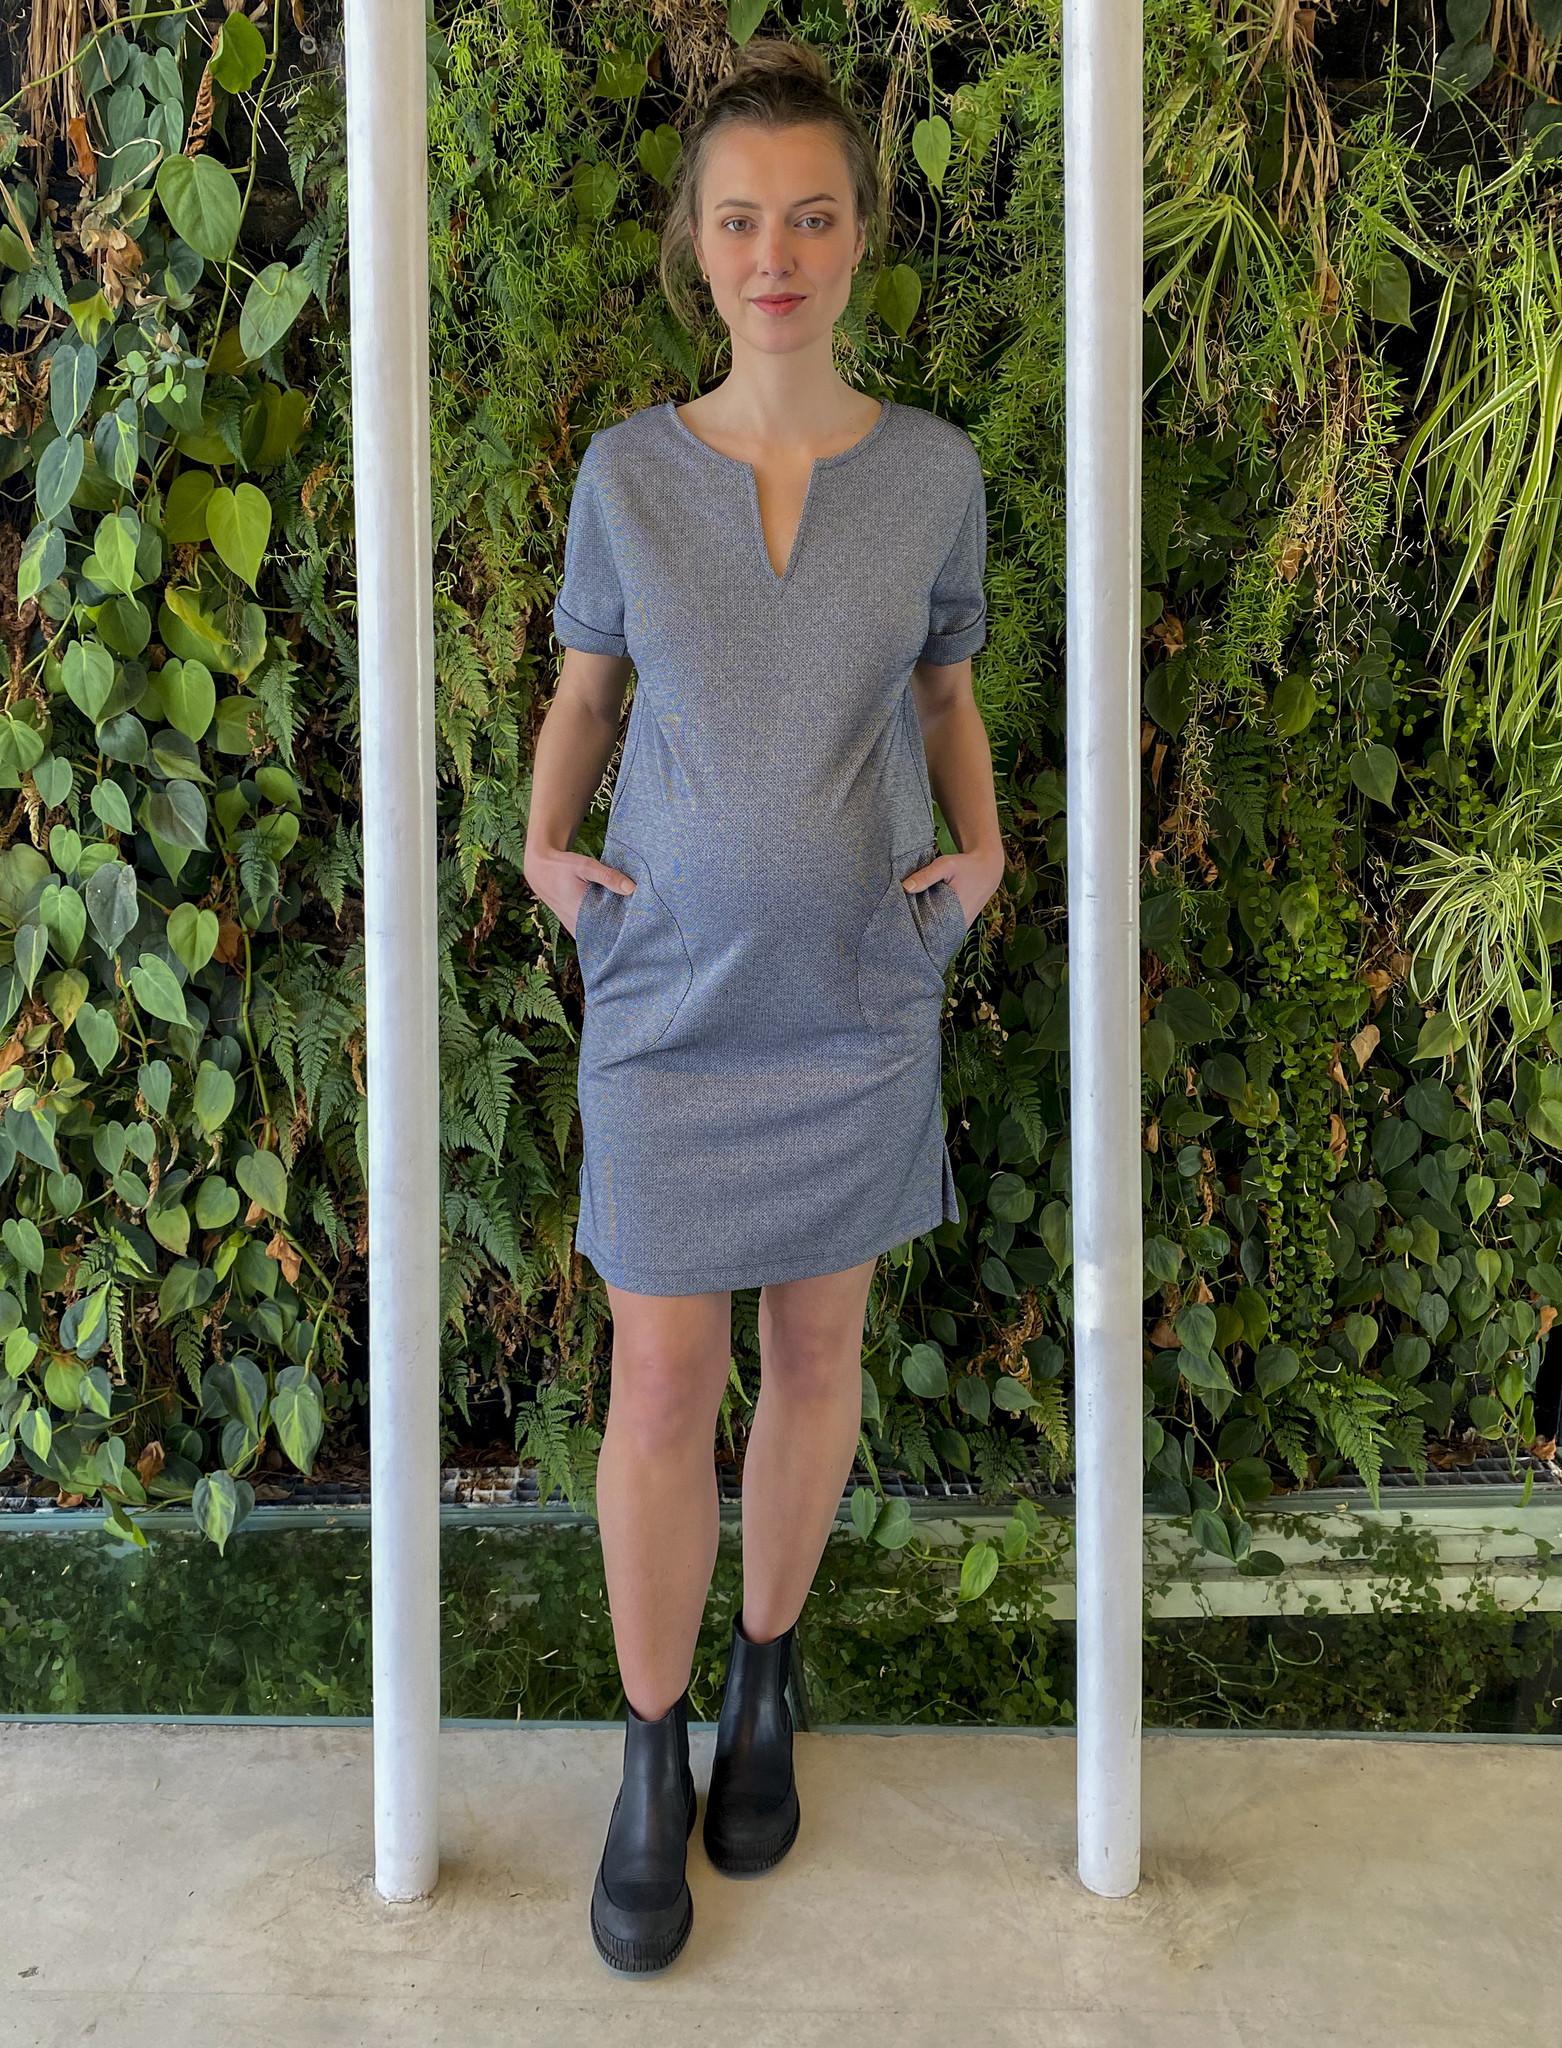 Round Pocket Dress Jeans Sparkle-3